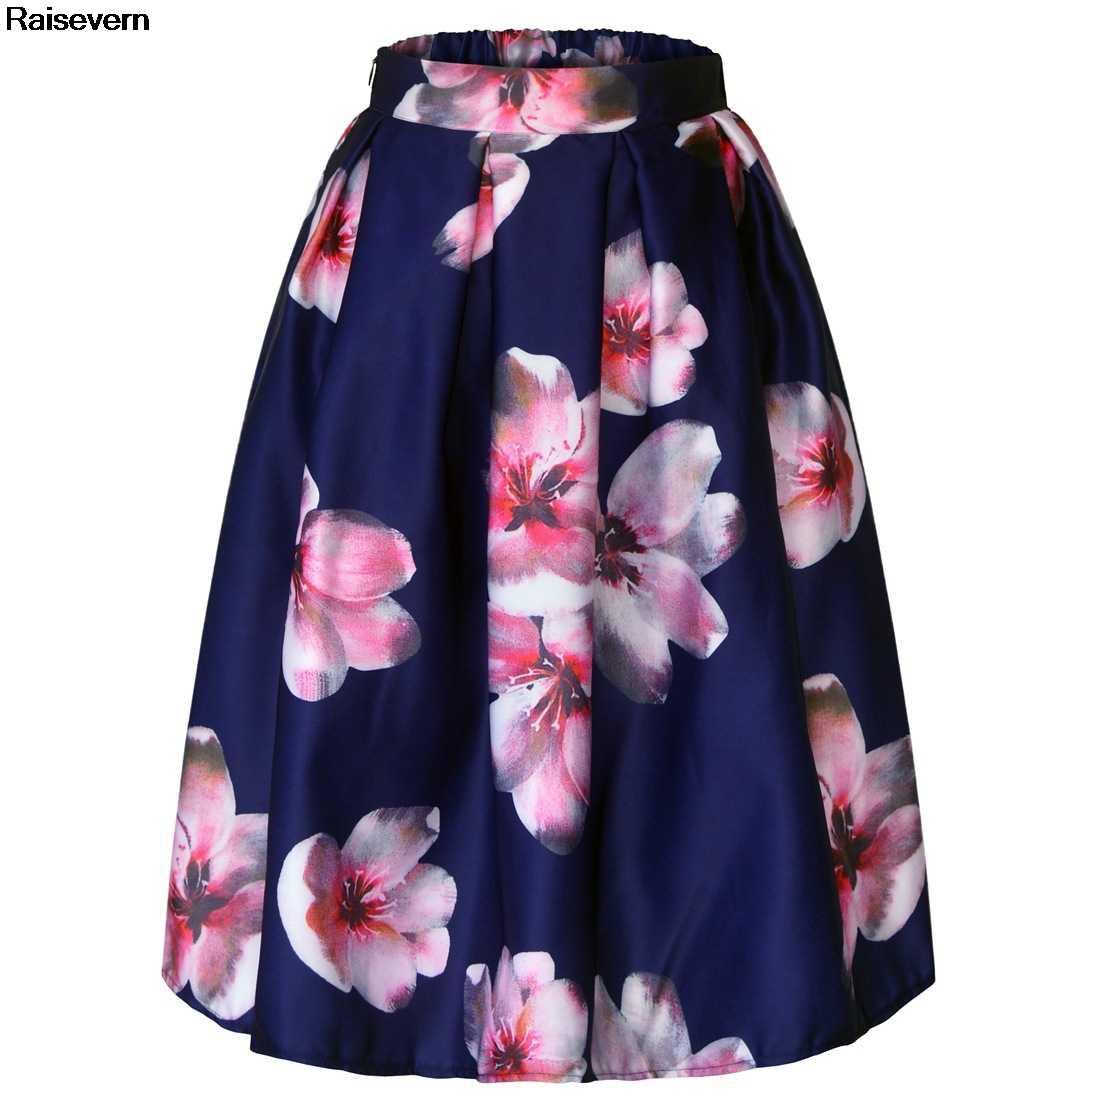 New Autumn Summer Women Midi Skirt 2018 Flower Floral Print Retro Vintage  Skirt 50s 60s Elastic 84a3604abdeb